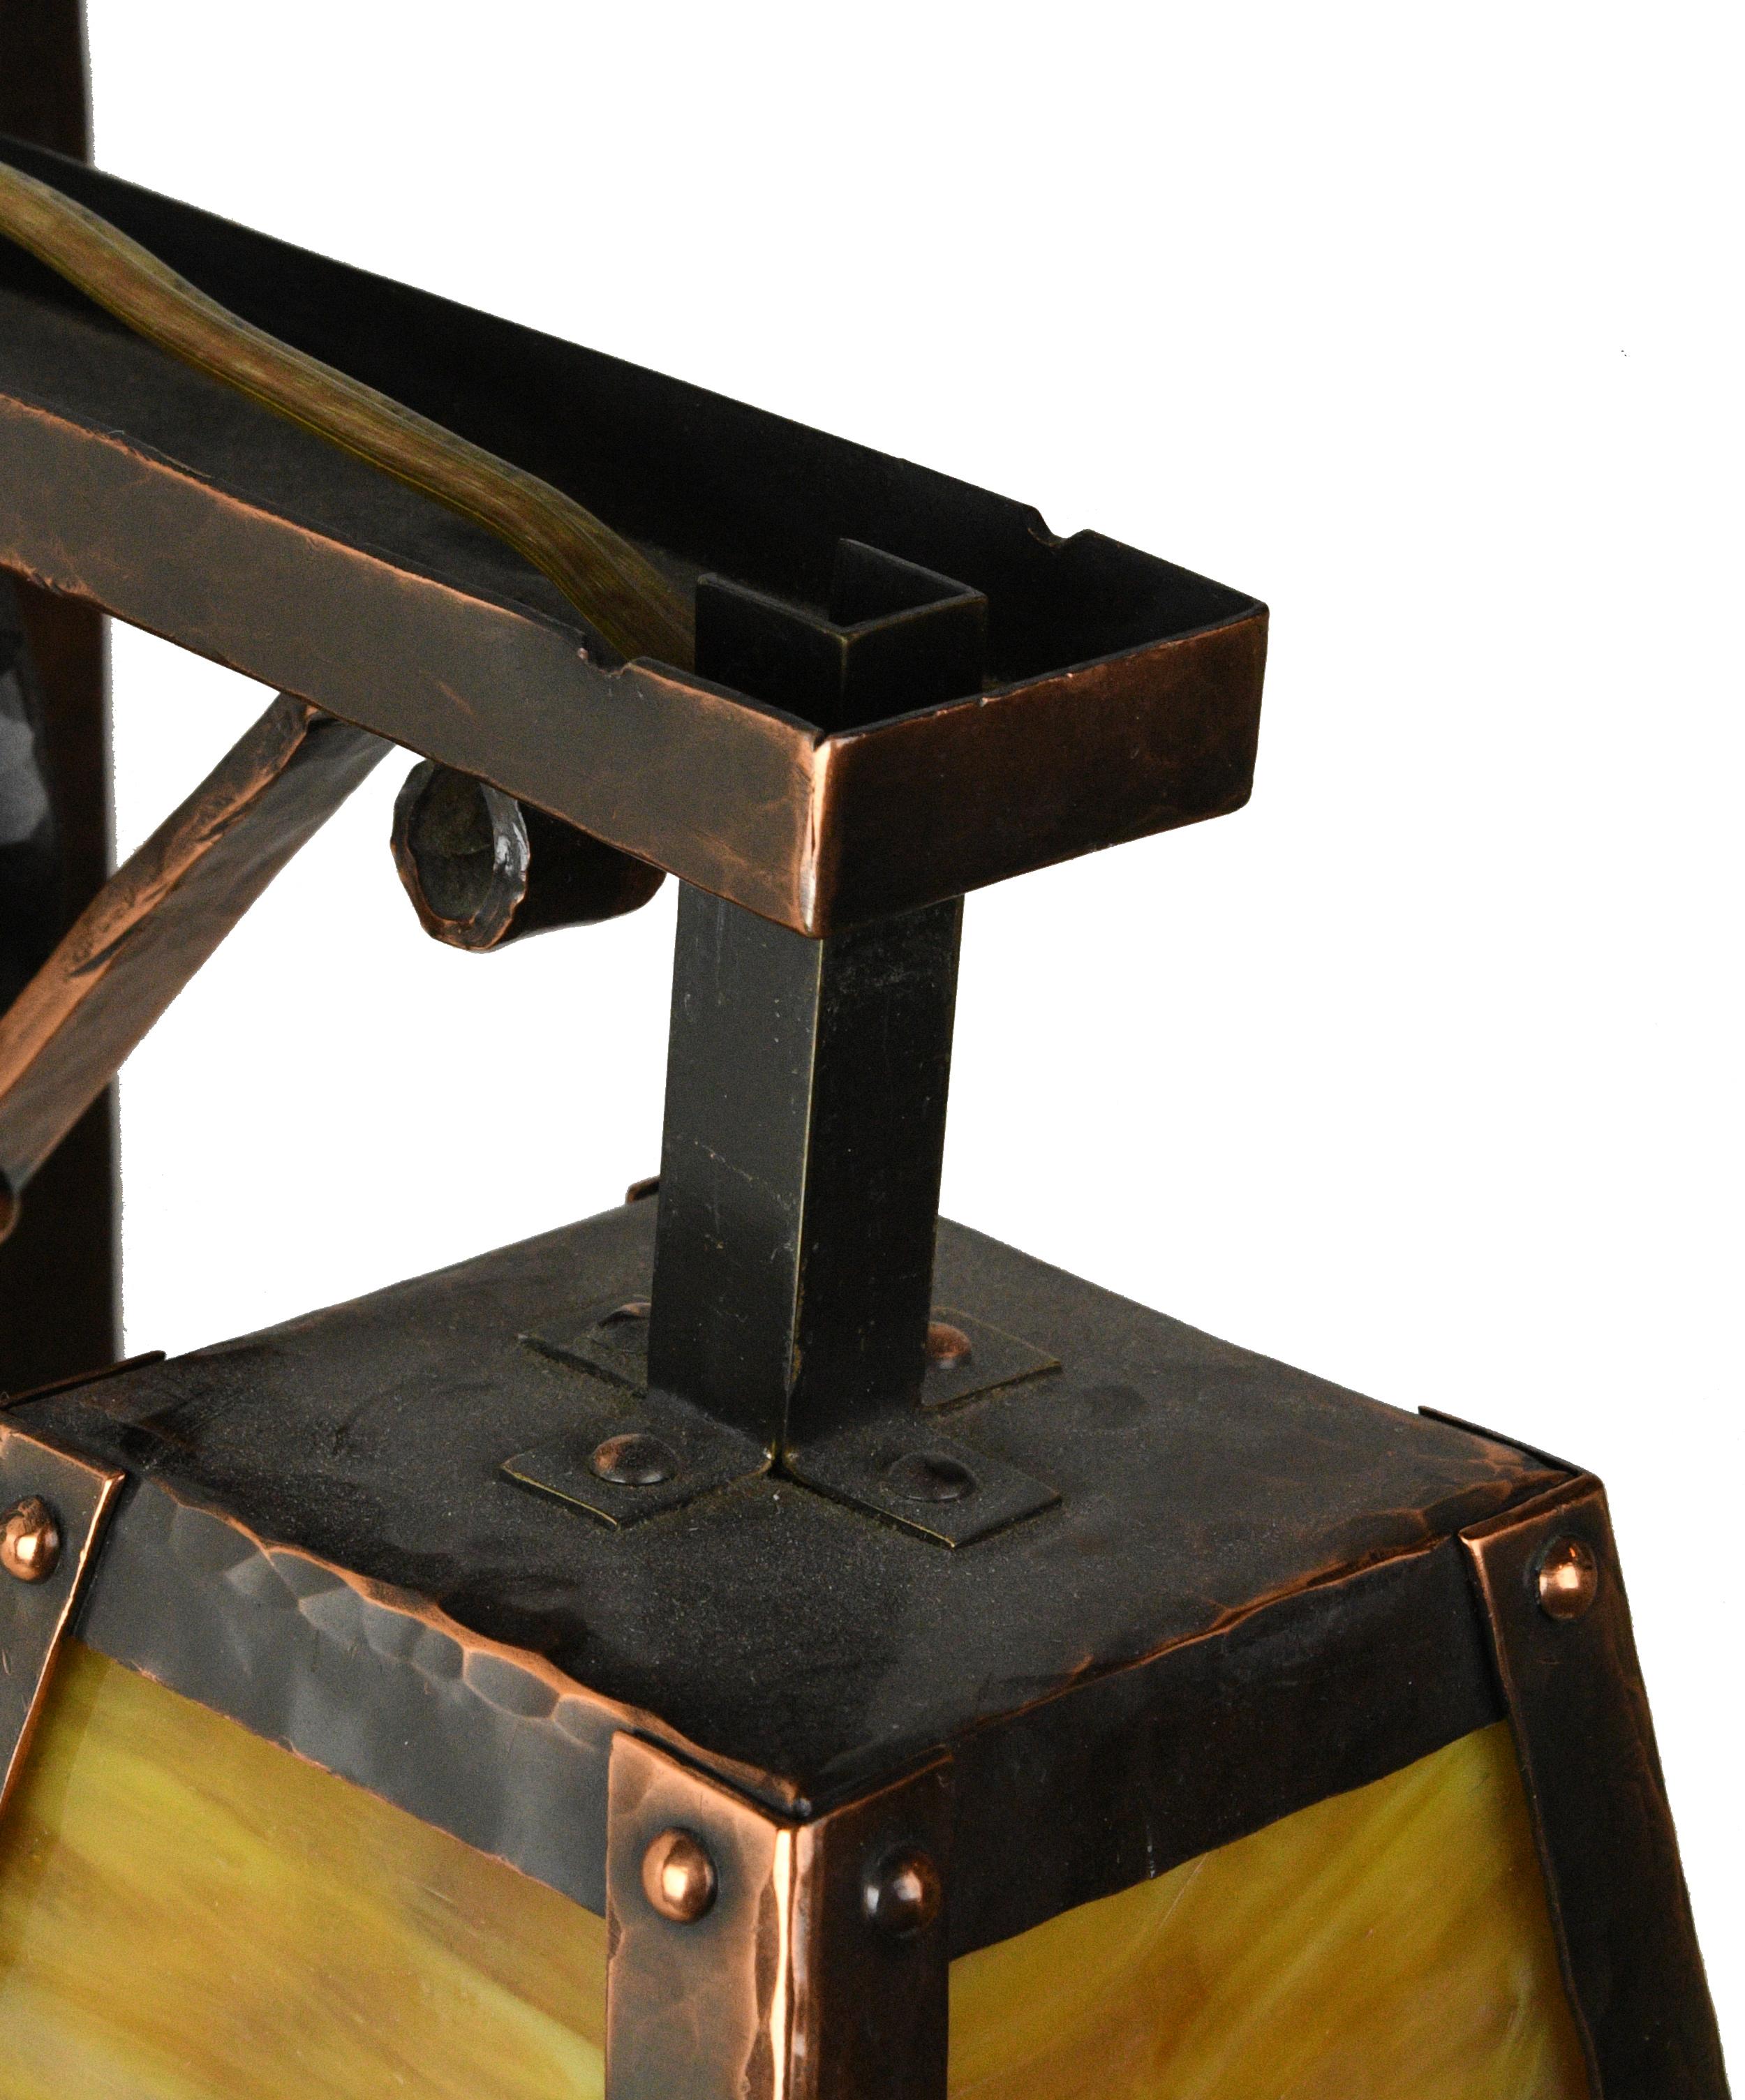 47771-slag-glass-bracket-sconce-close-3.jpg